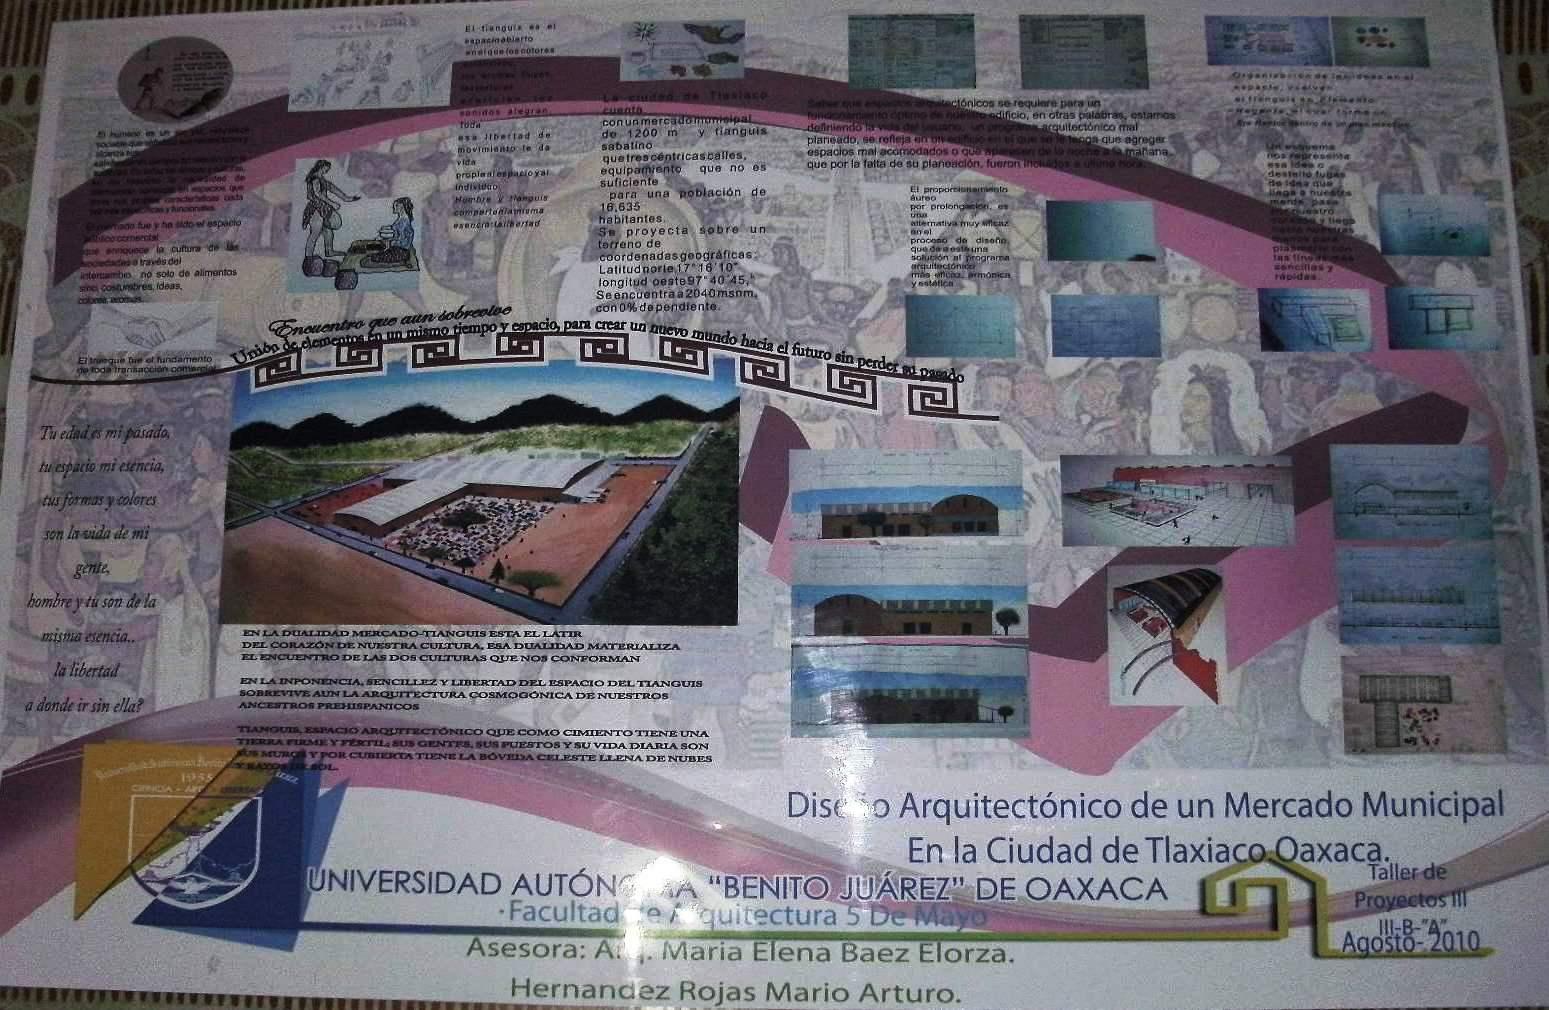 DISEÑO ARQUITECTÓNICO DE UN MERCADO MUNICIPAL, EN TLAXIACO, OAXACA ...